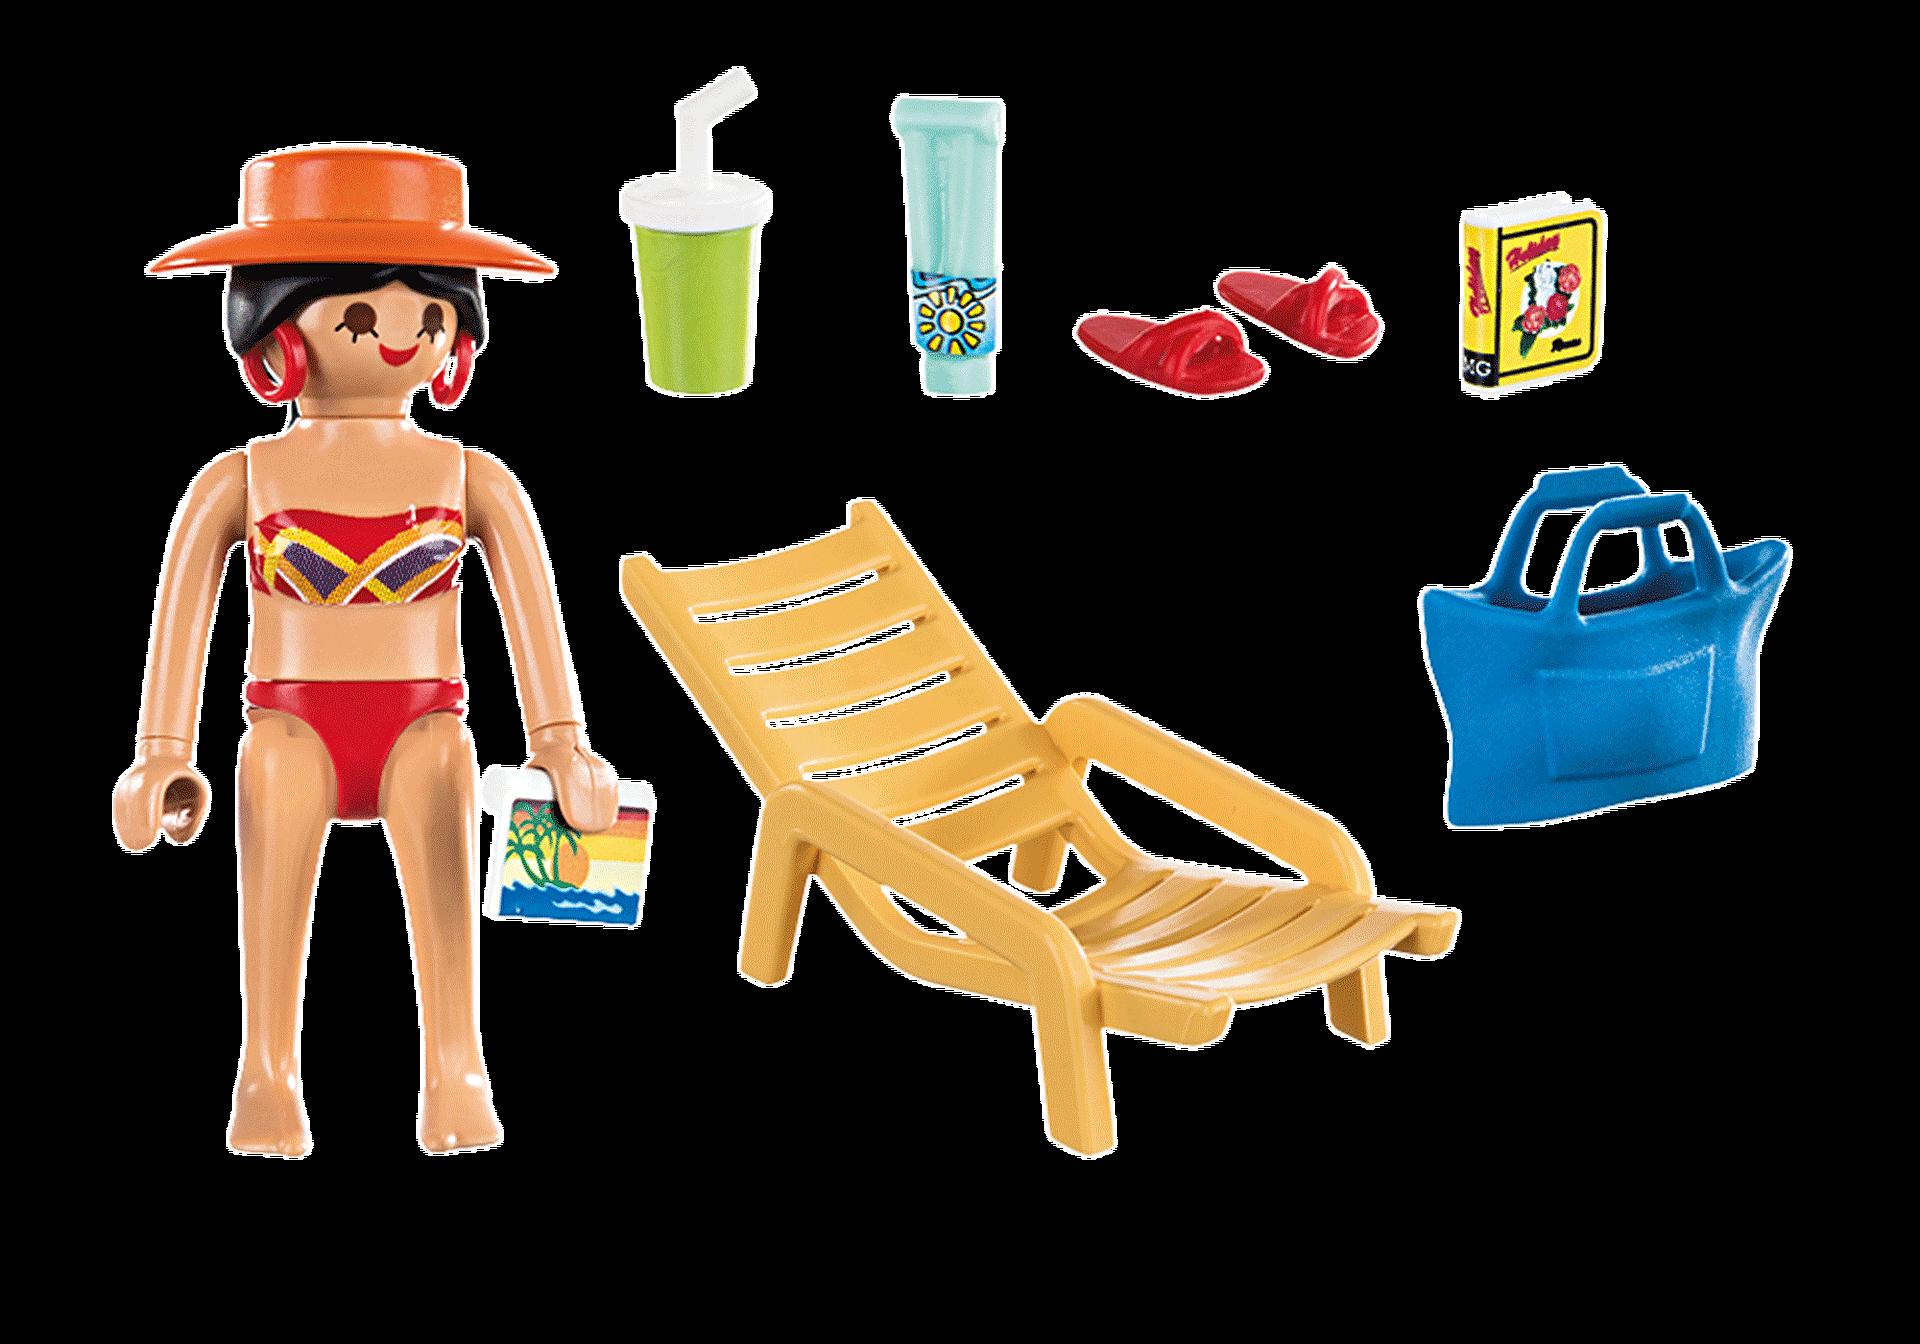 70300 Sunbather with Lounge Chair zoom image3